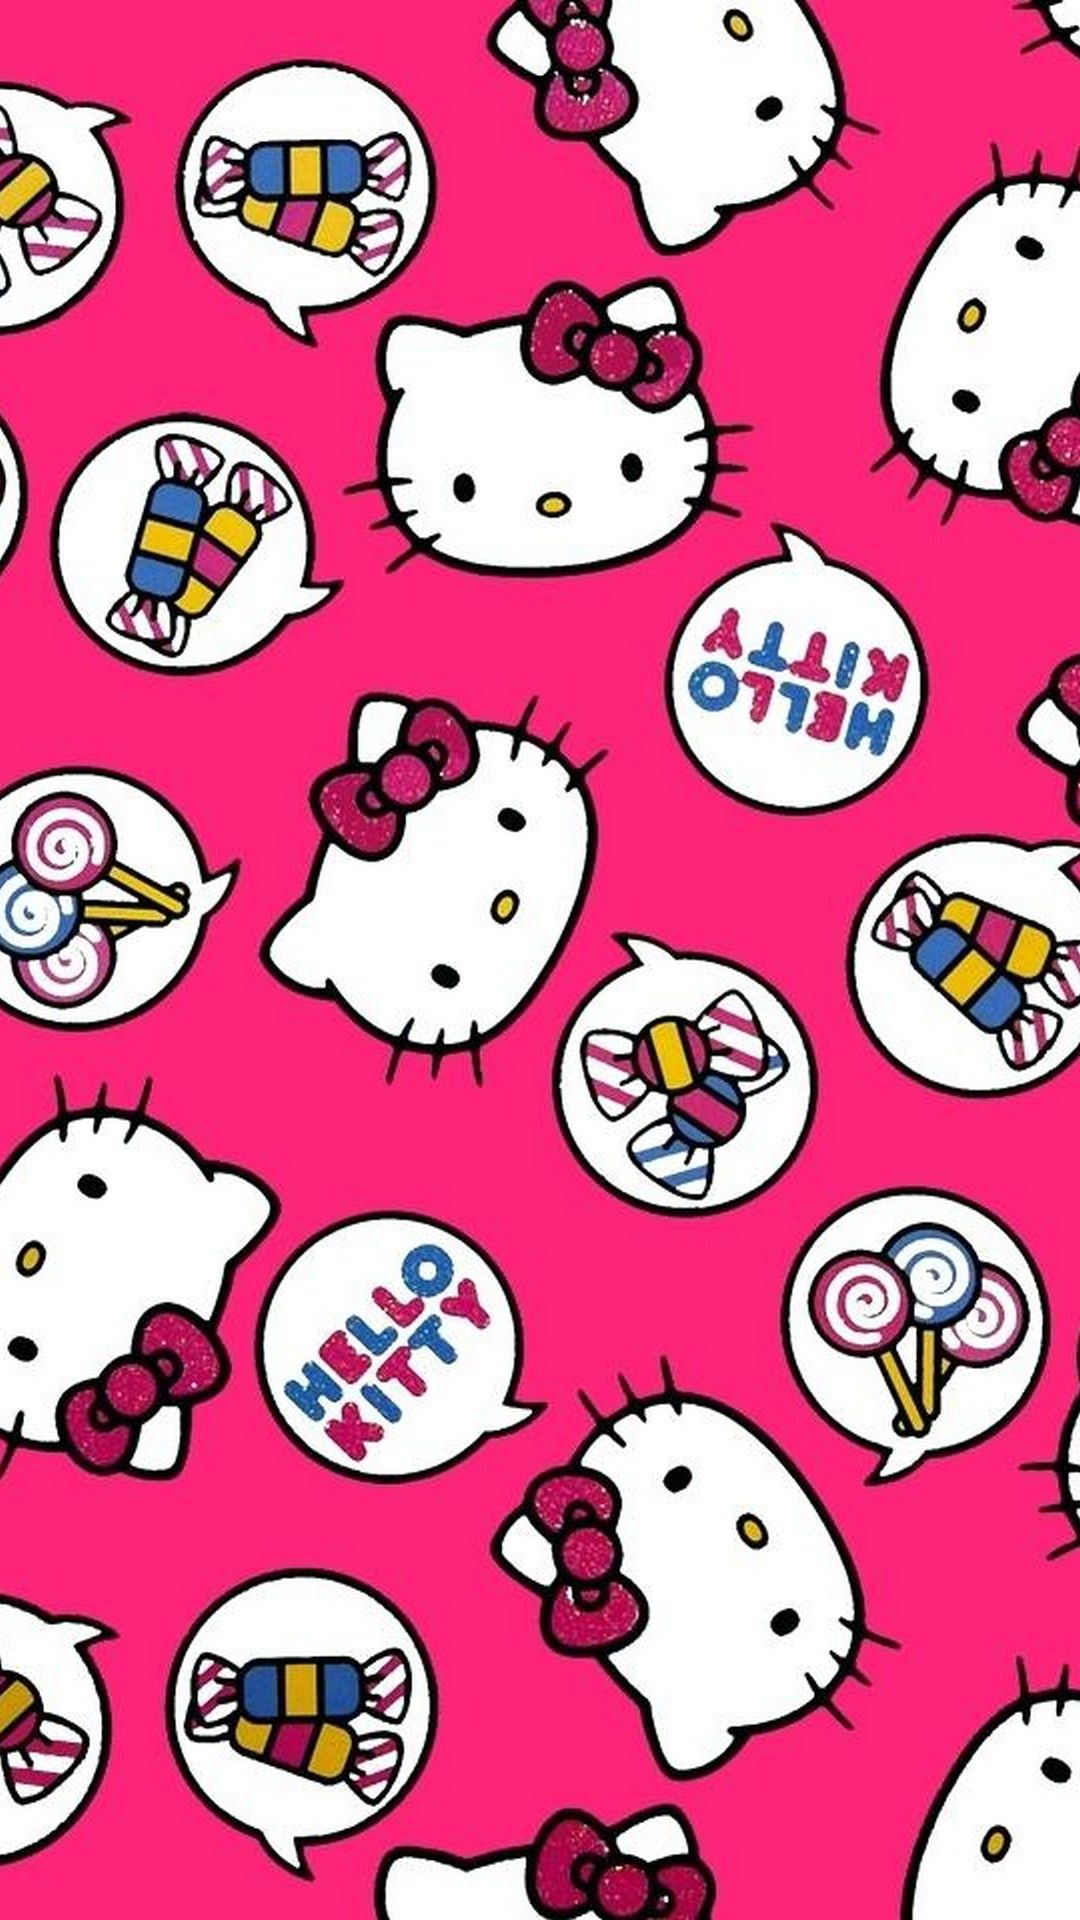 Sanrio Hello Kitty Iphone 6 Wallpaper Best Hd Wallpapers